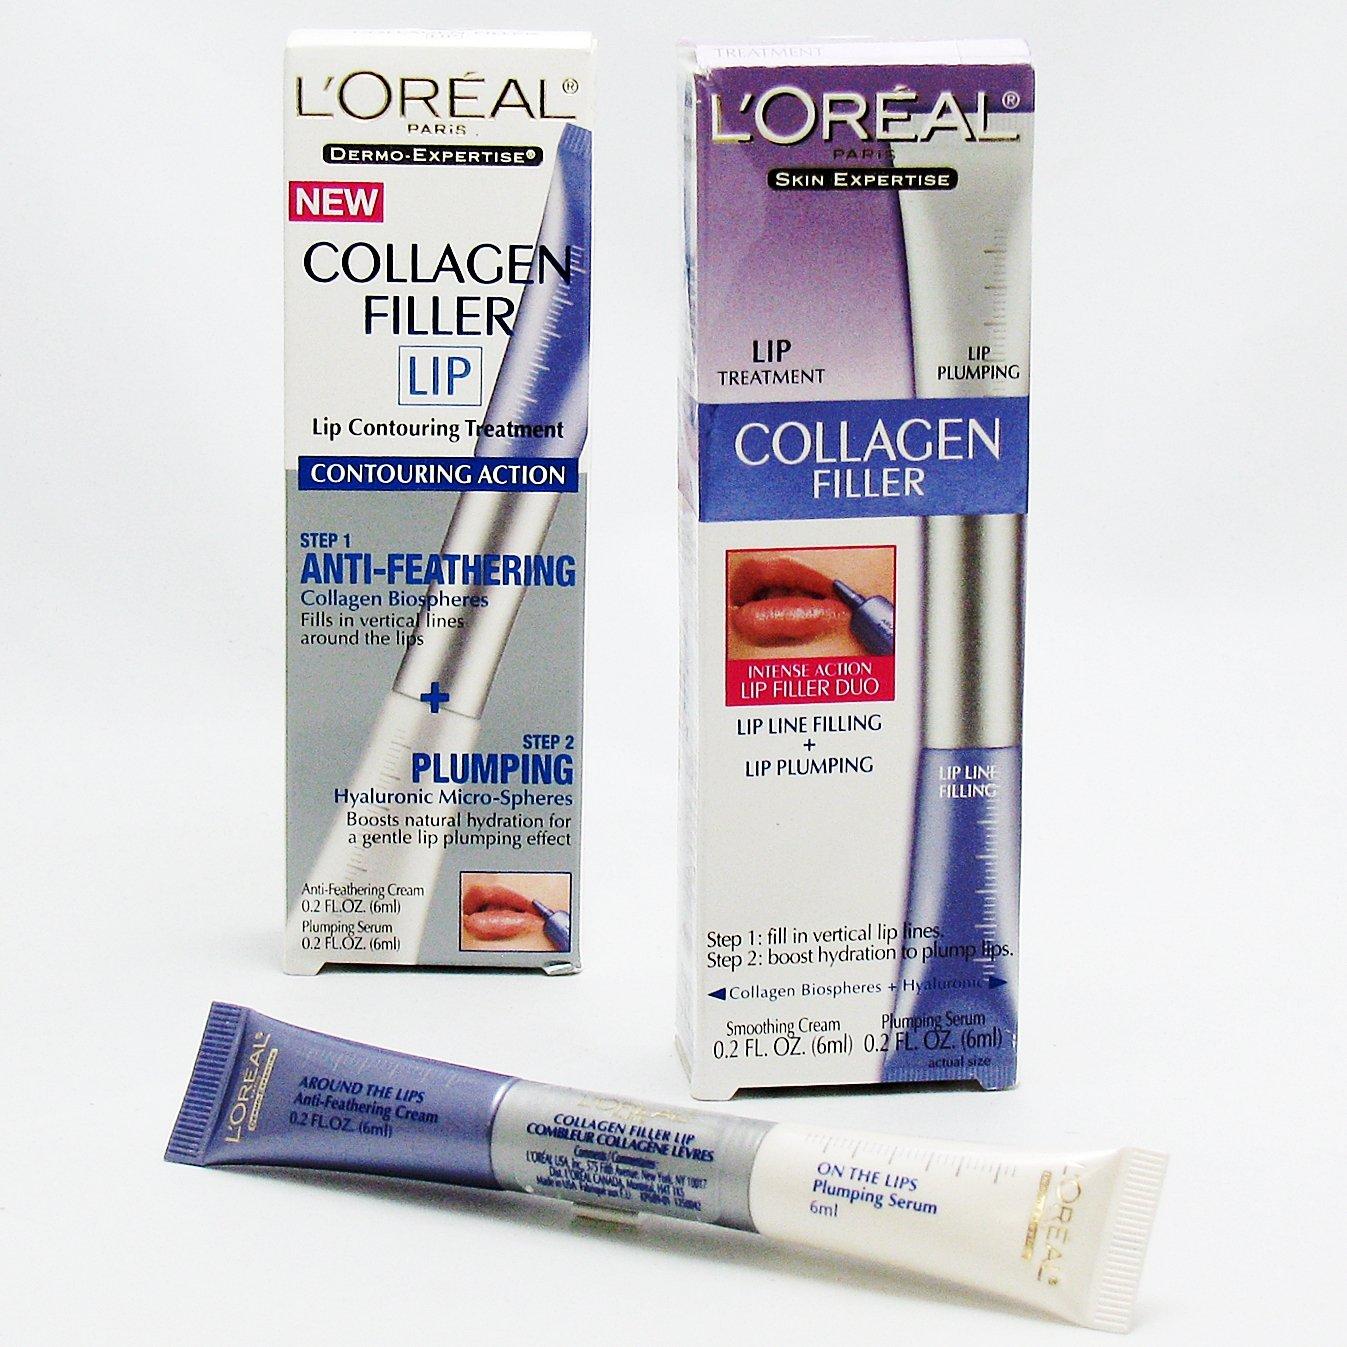 Cheap Loreal Paris Collagen Filler Lip Treatment Smoothing Cream Maybelline Hypermatte Liquid Liner Blister Black Matte 3g 02 Oz Plumping